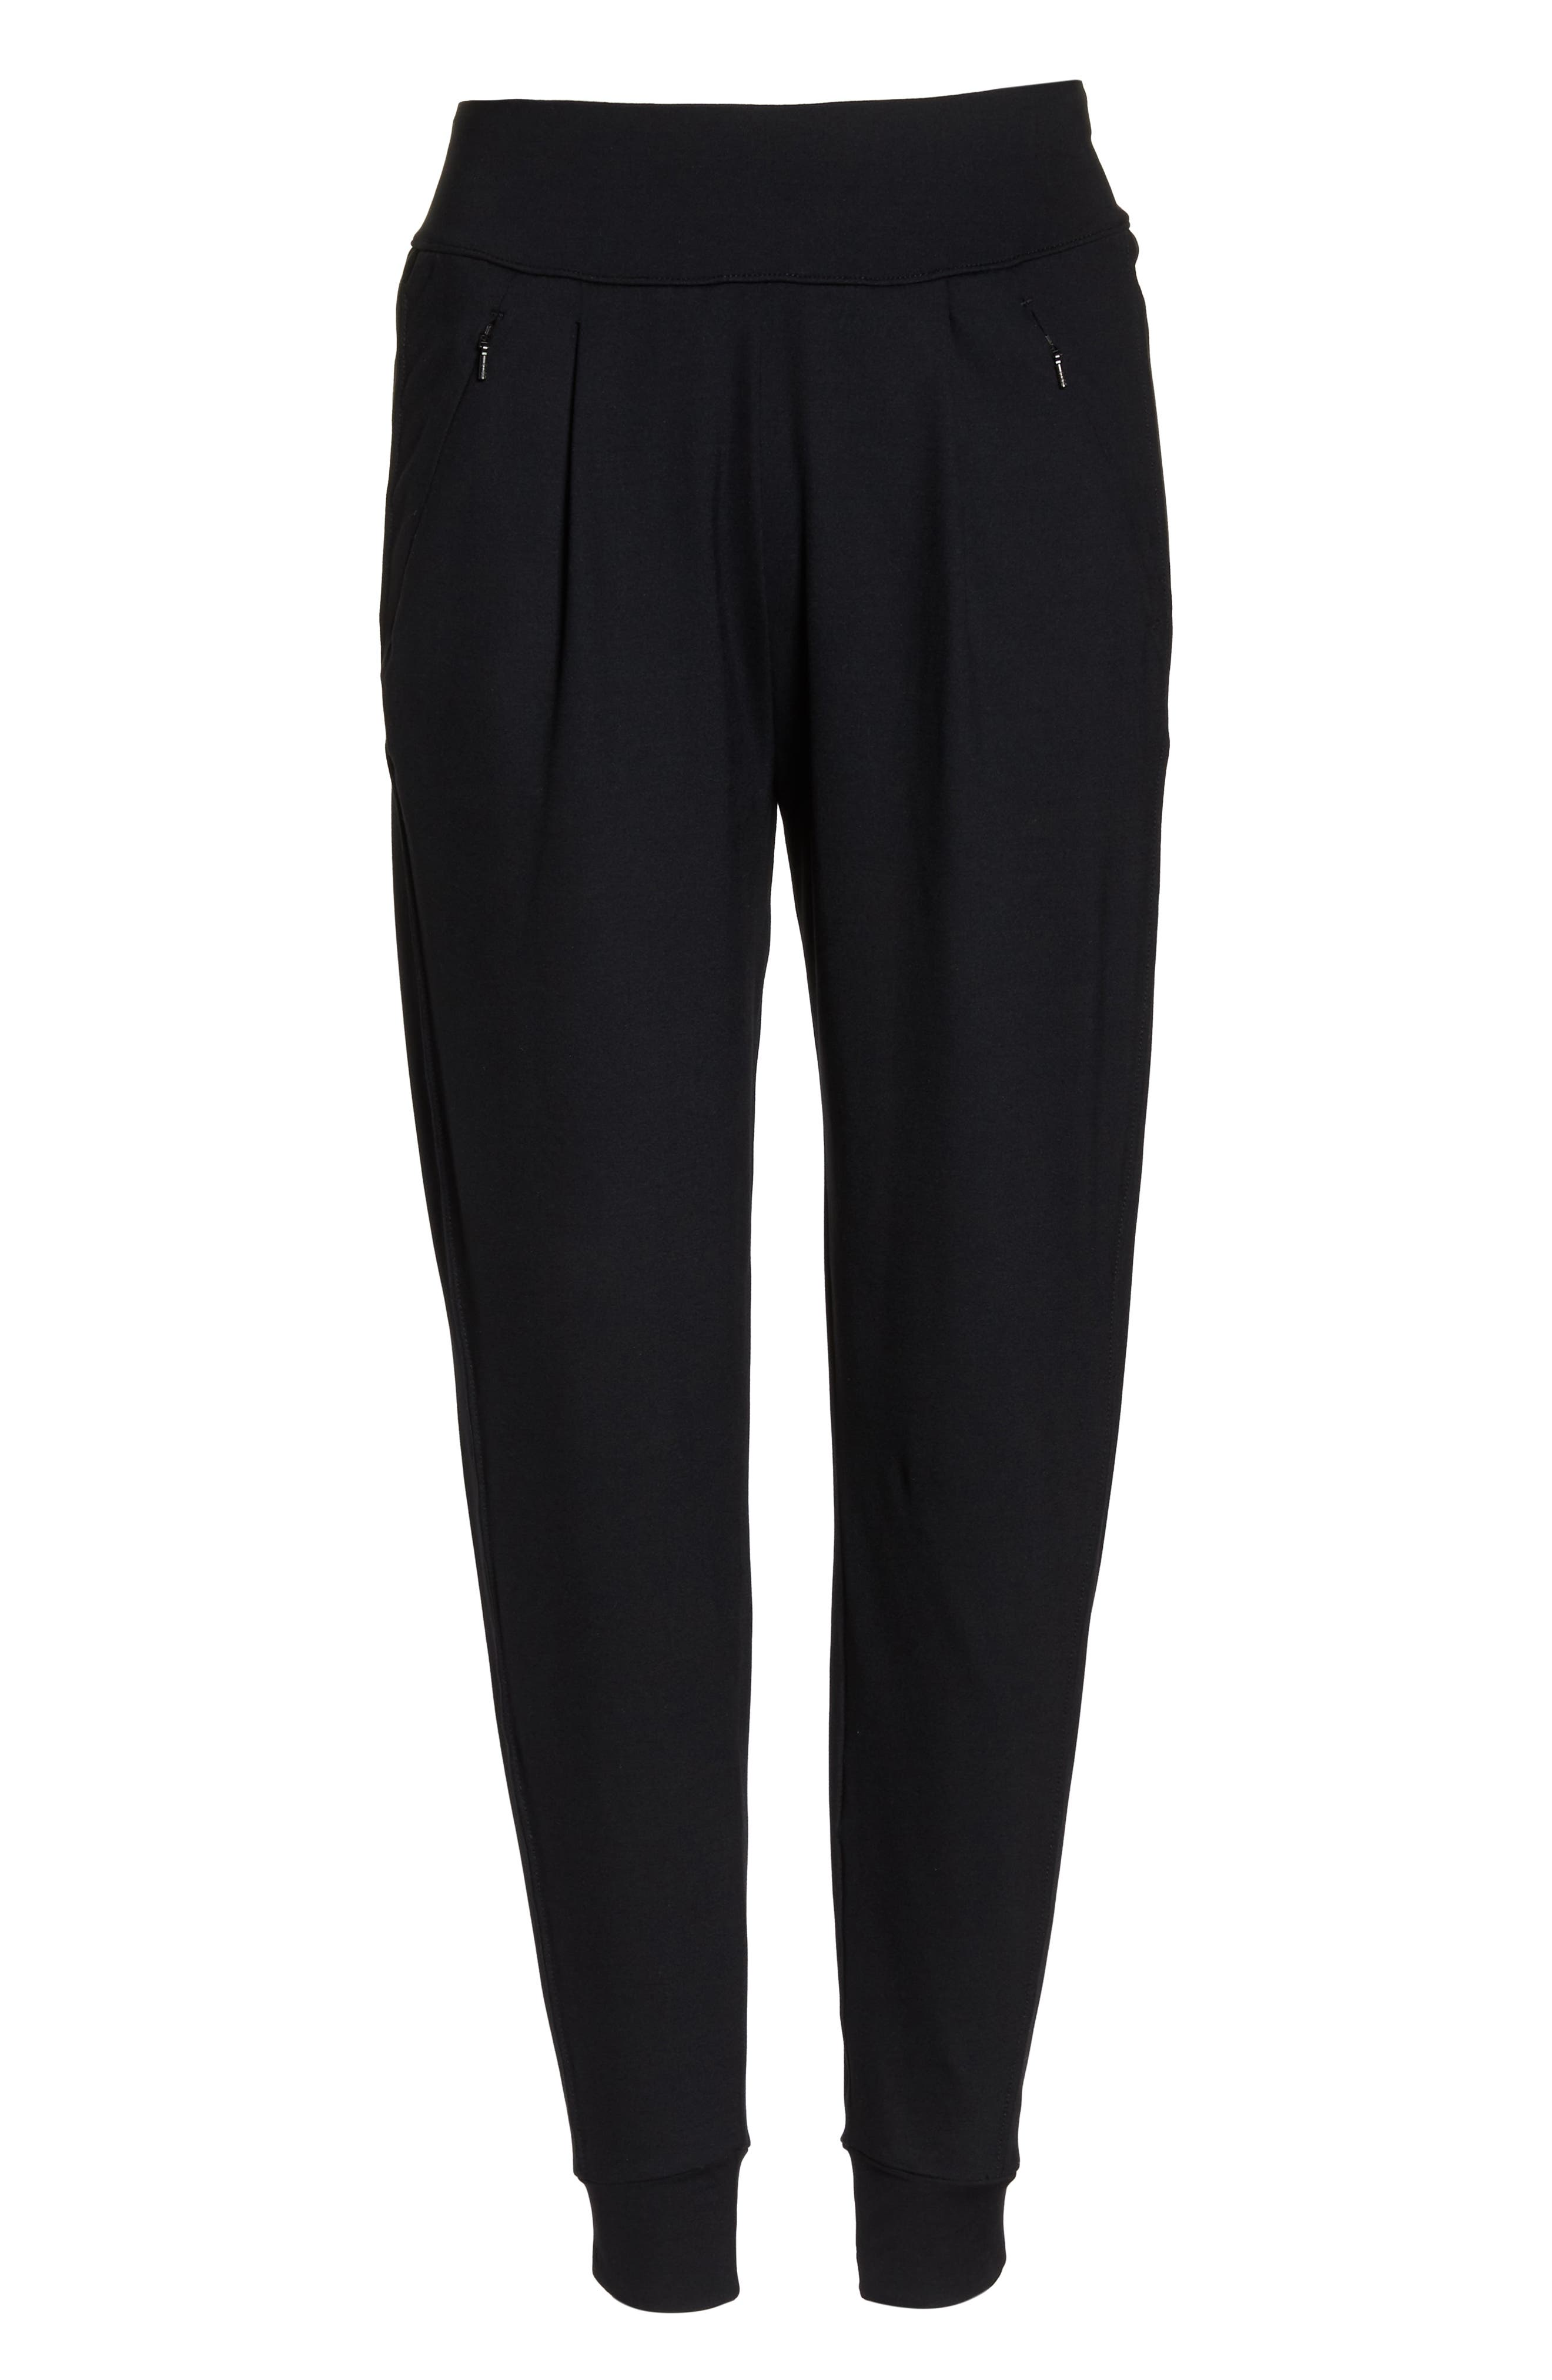 Taylor Slim Recycled Knit Jogger Pants,                             Alternate thumbnail 7, color,                             BLACK